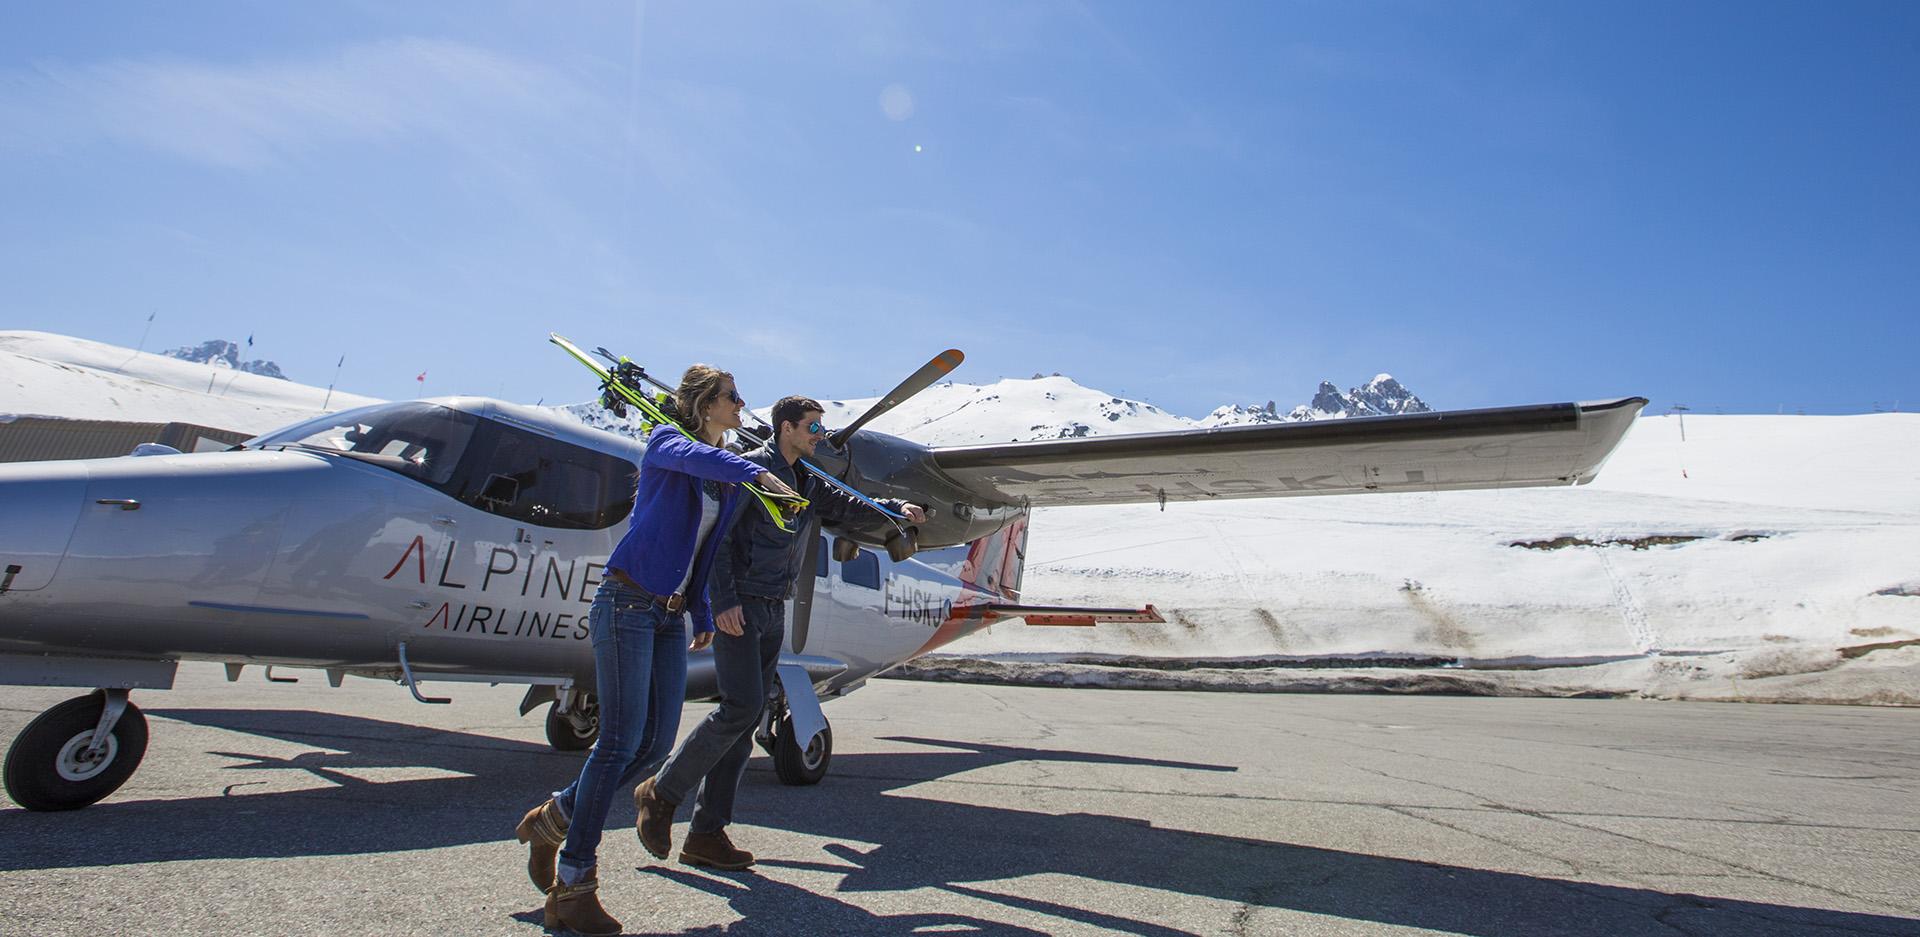 Altiport de Courchevel Transferts Air Taxi Alpine Airlines